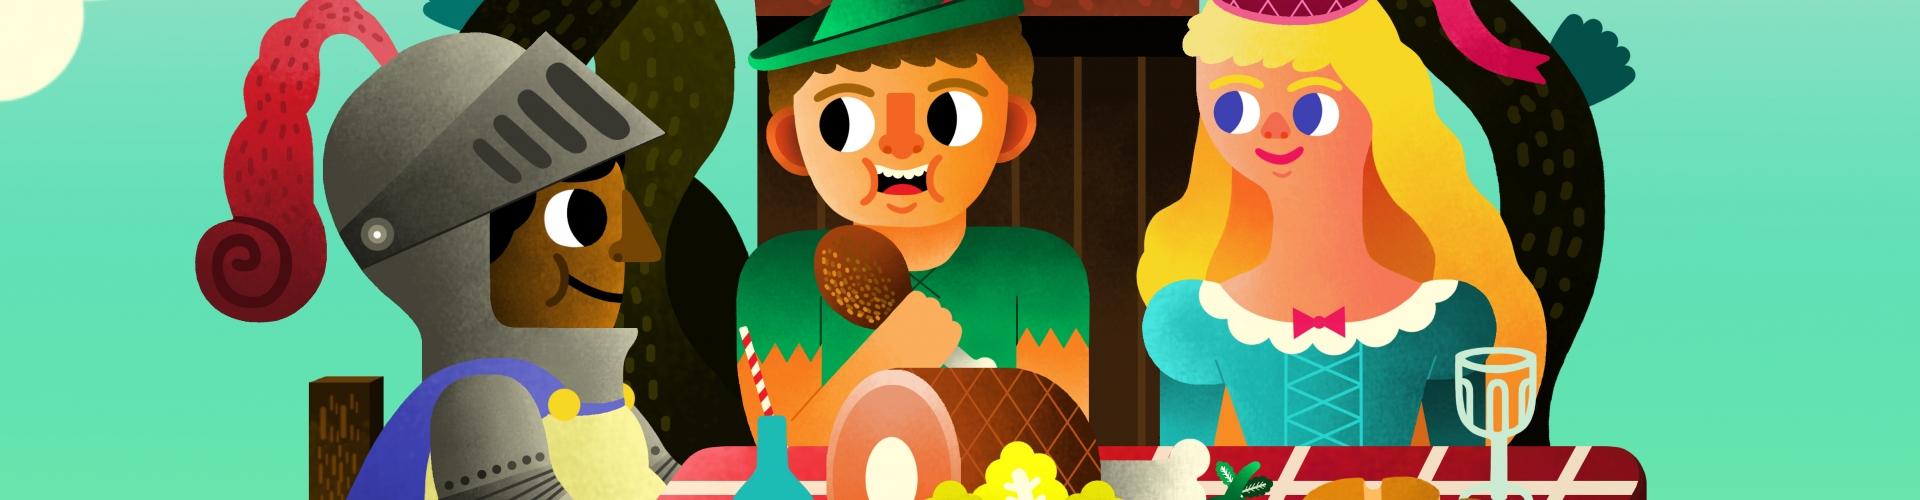 Lesmateriaal Smakelijke Sprookjes - Theatra